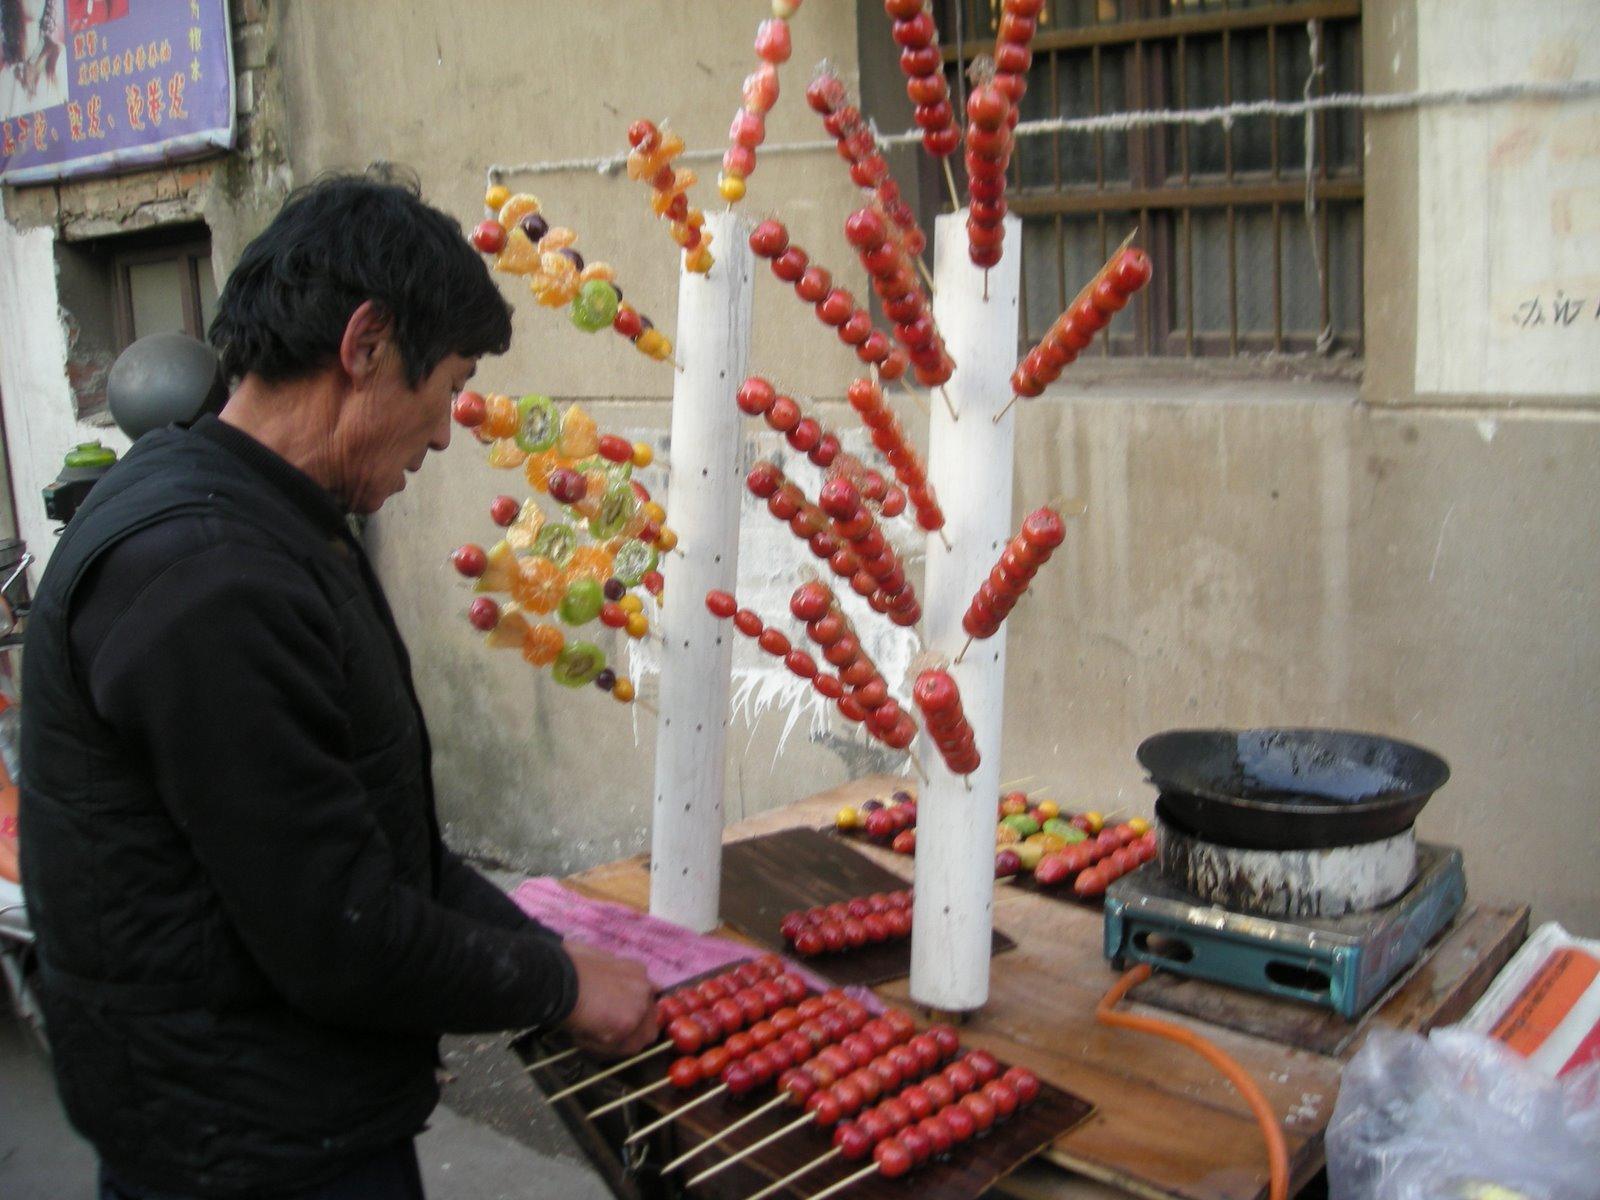 Candyman in China